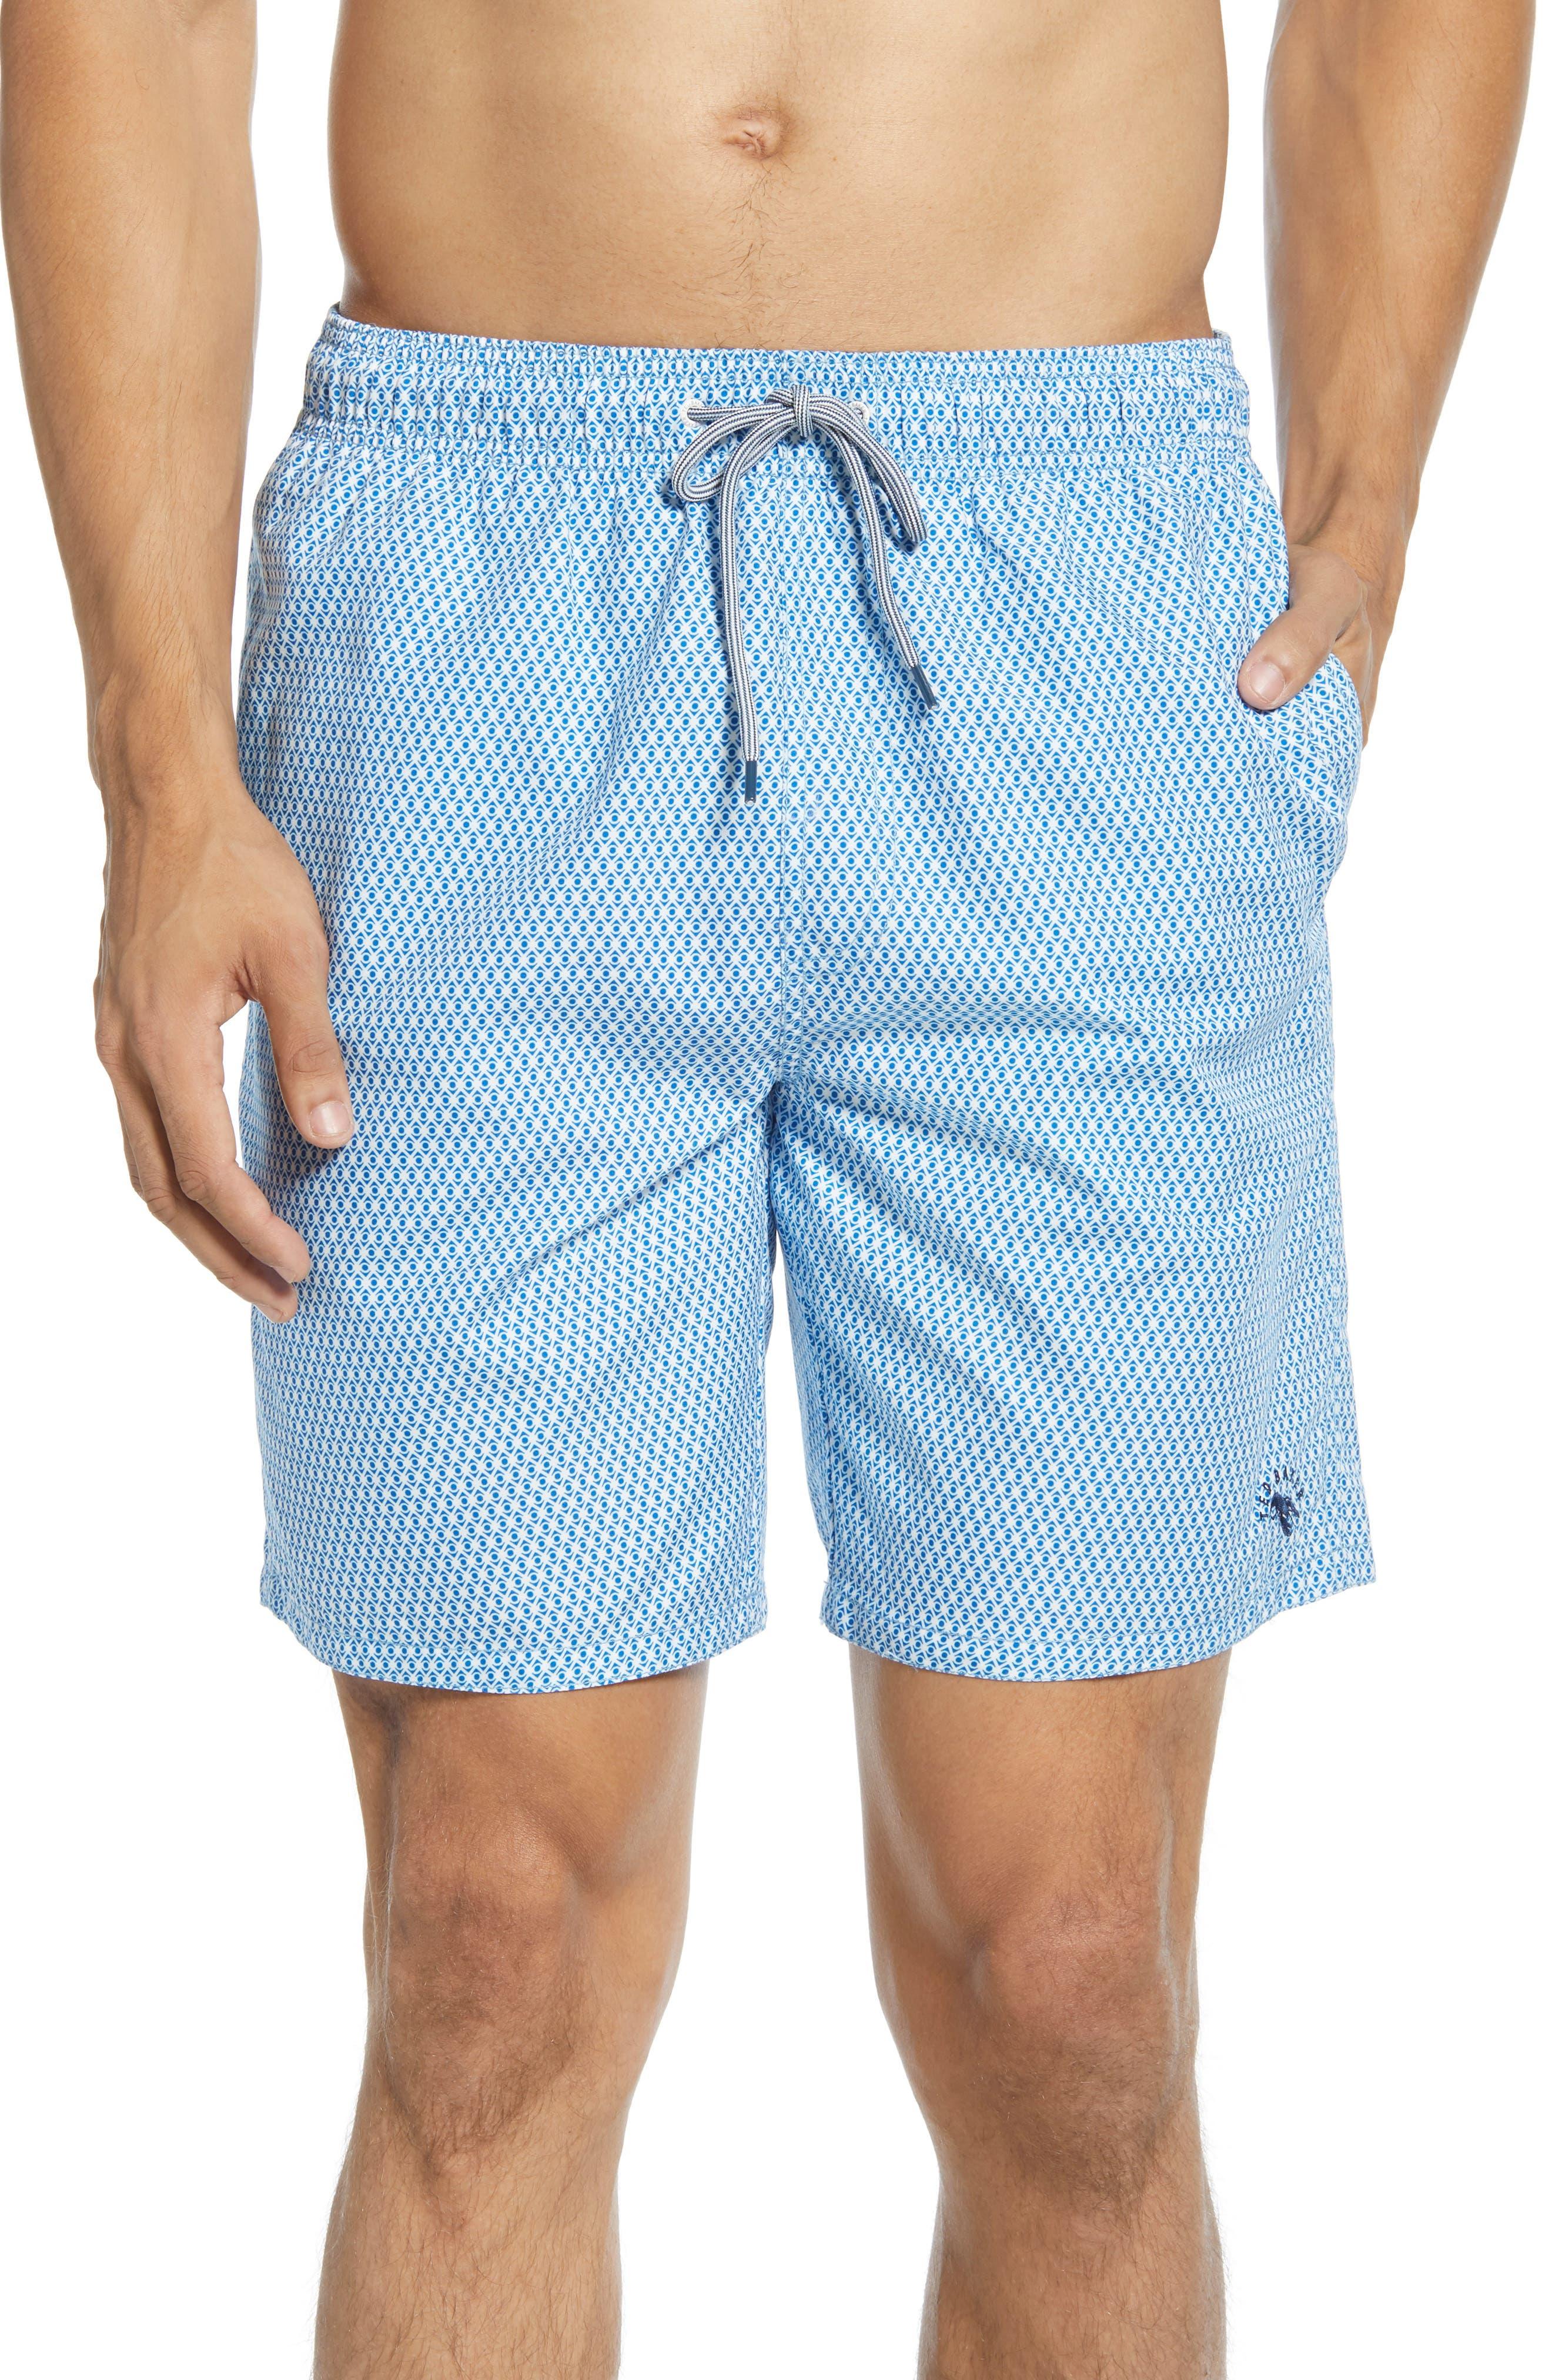 NEW Hurley teal blue stripe boys youth swim board shorts swimsuit sz 4 6 7